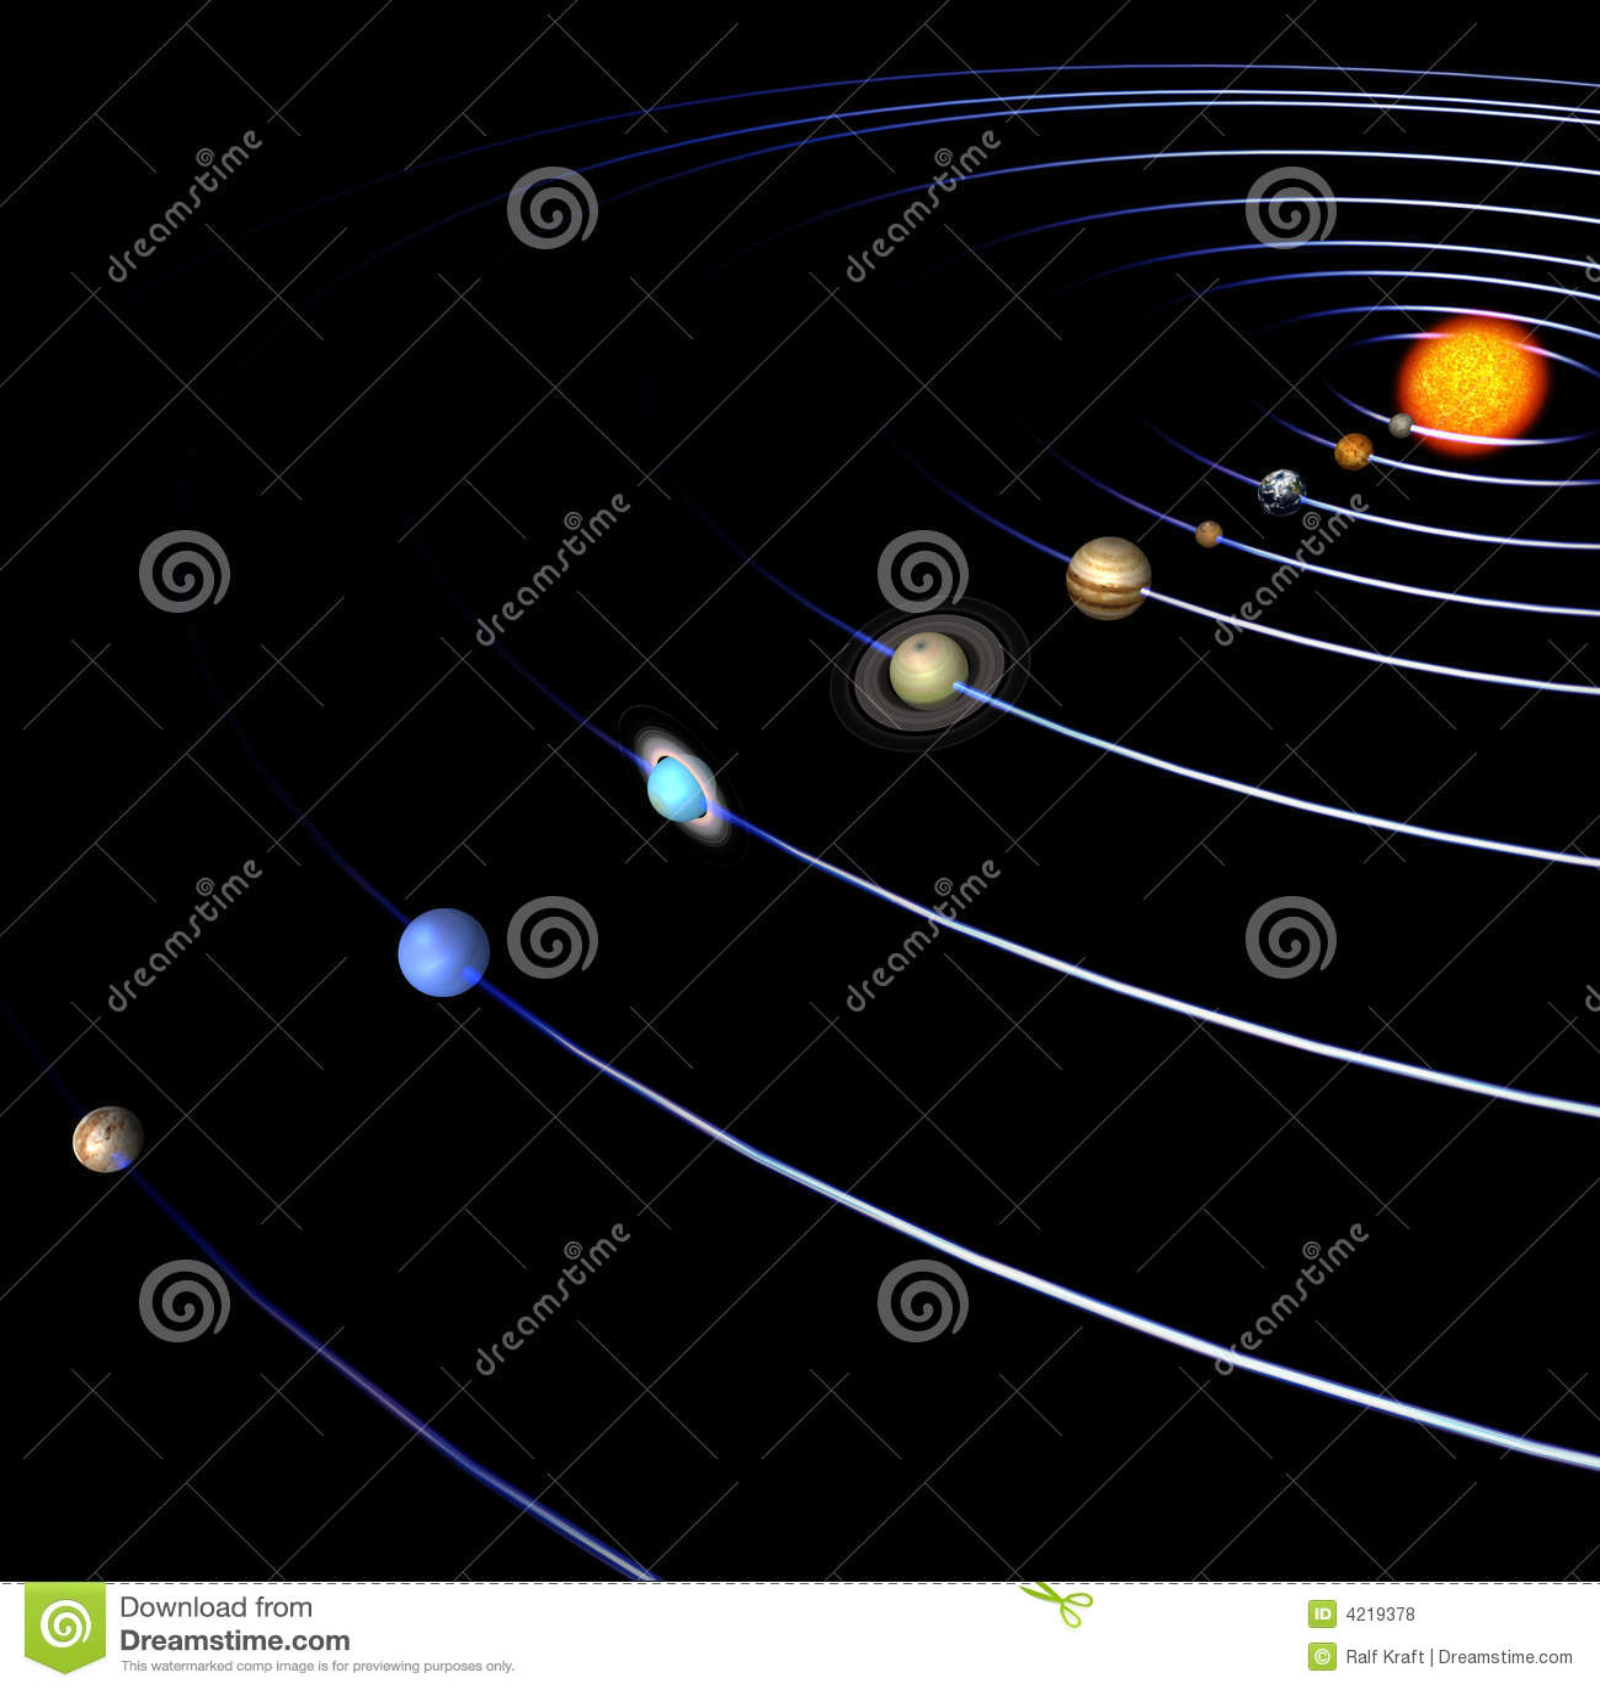 solar system paths - photo #23